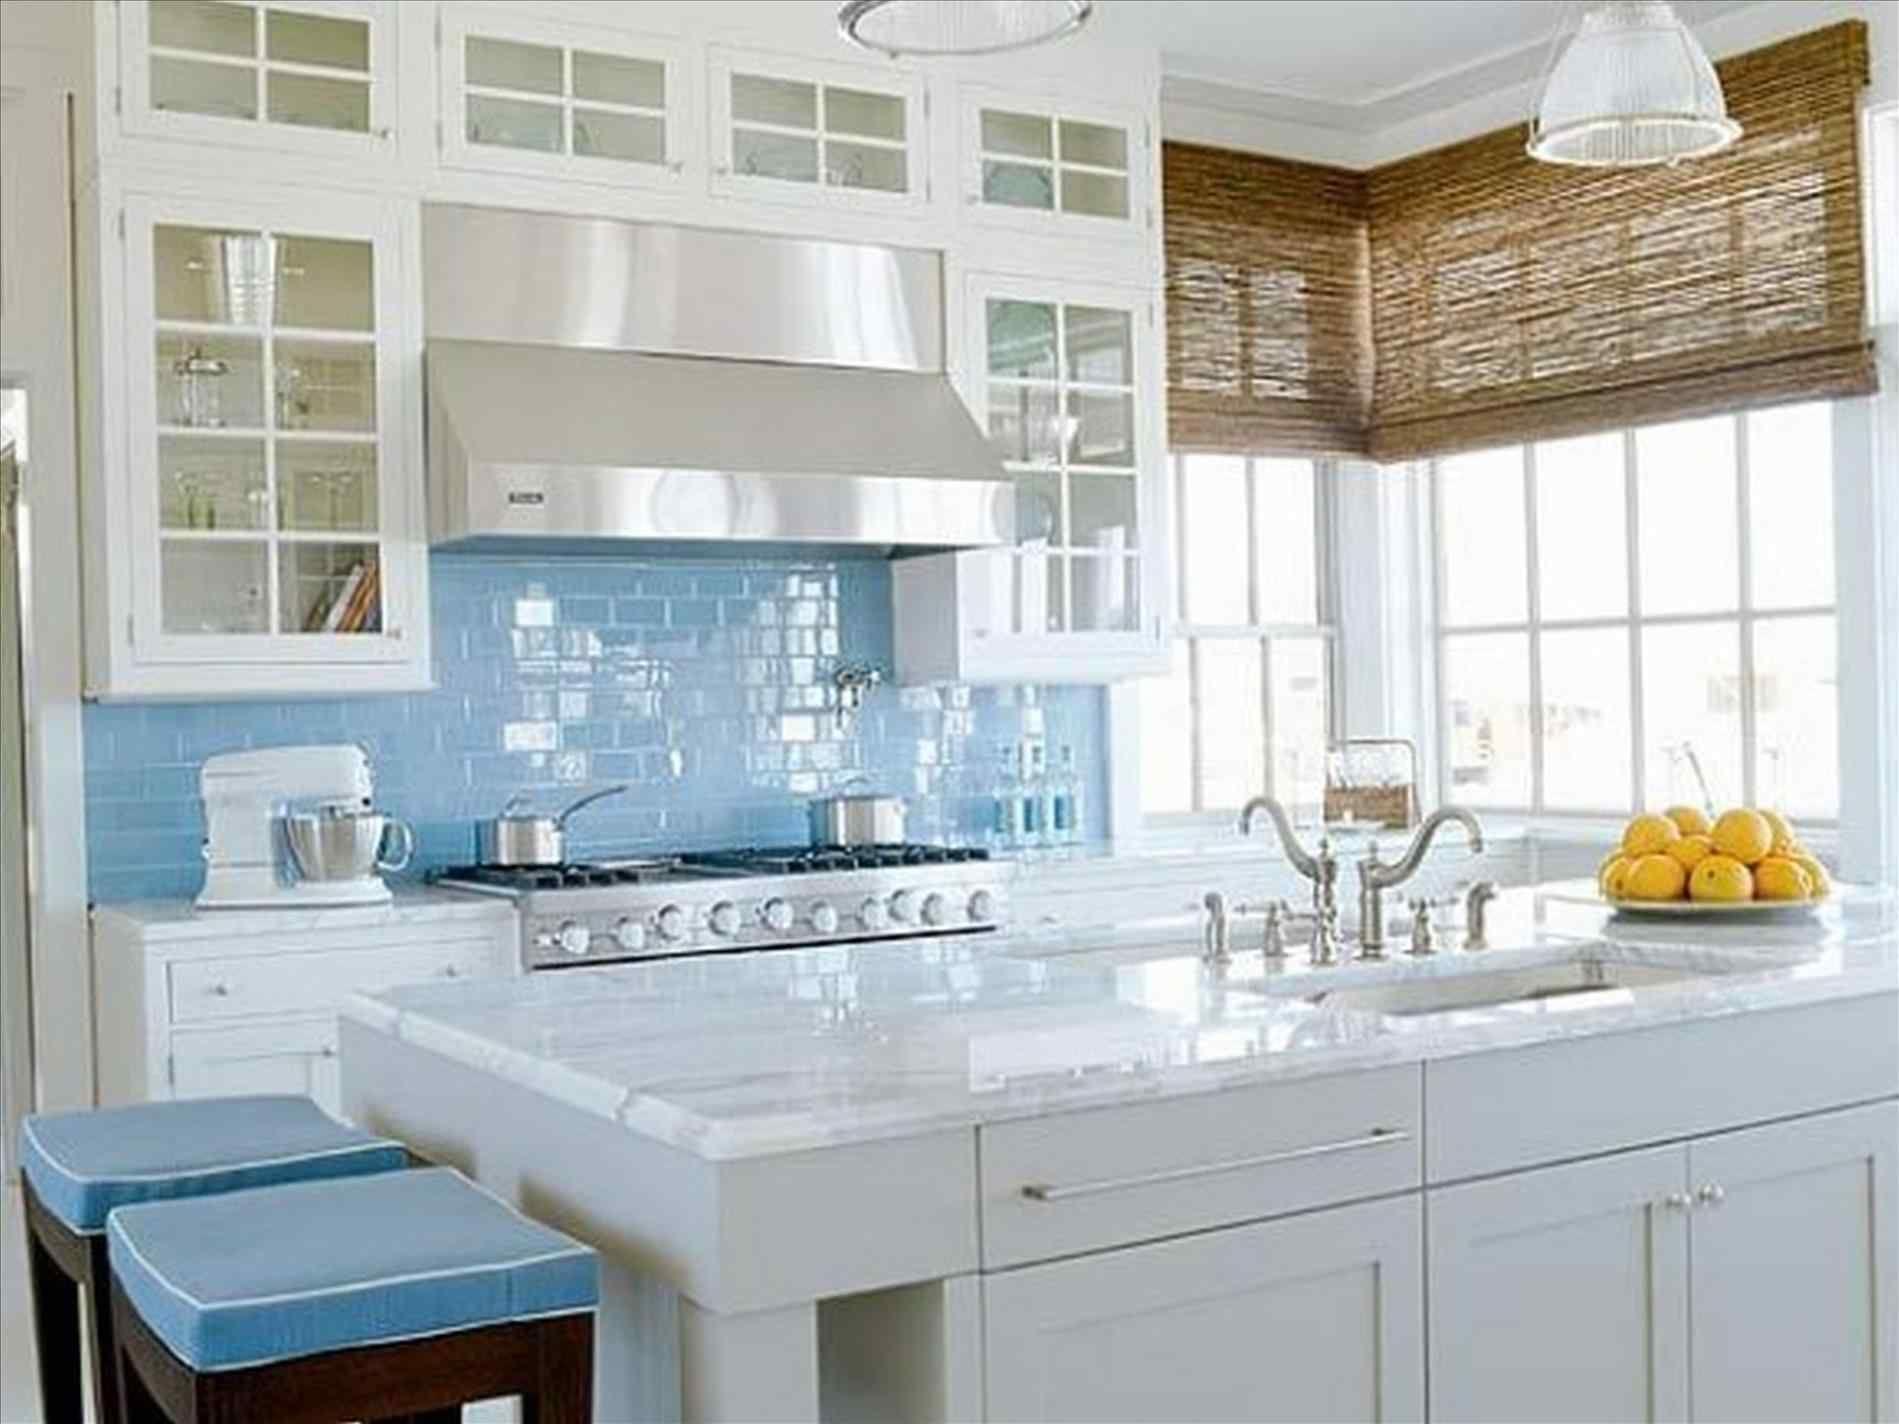 New kitchen backsplash designs with white cabinets at xxbb821.info ...